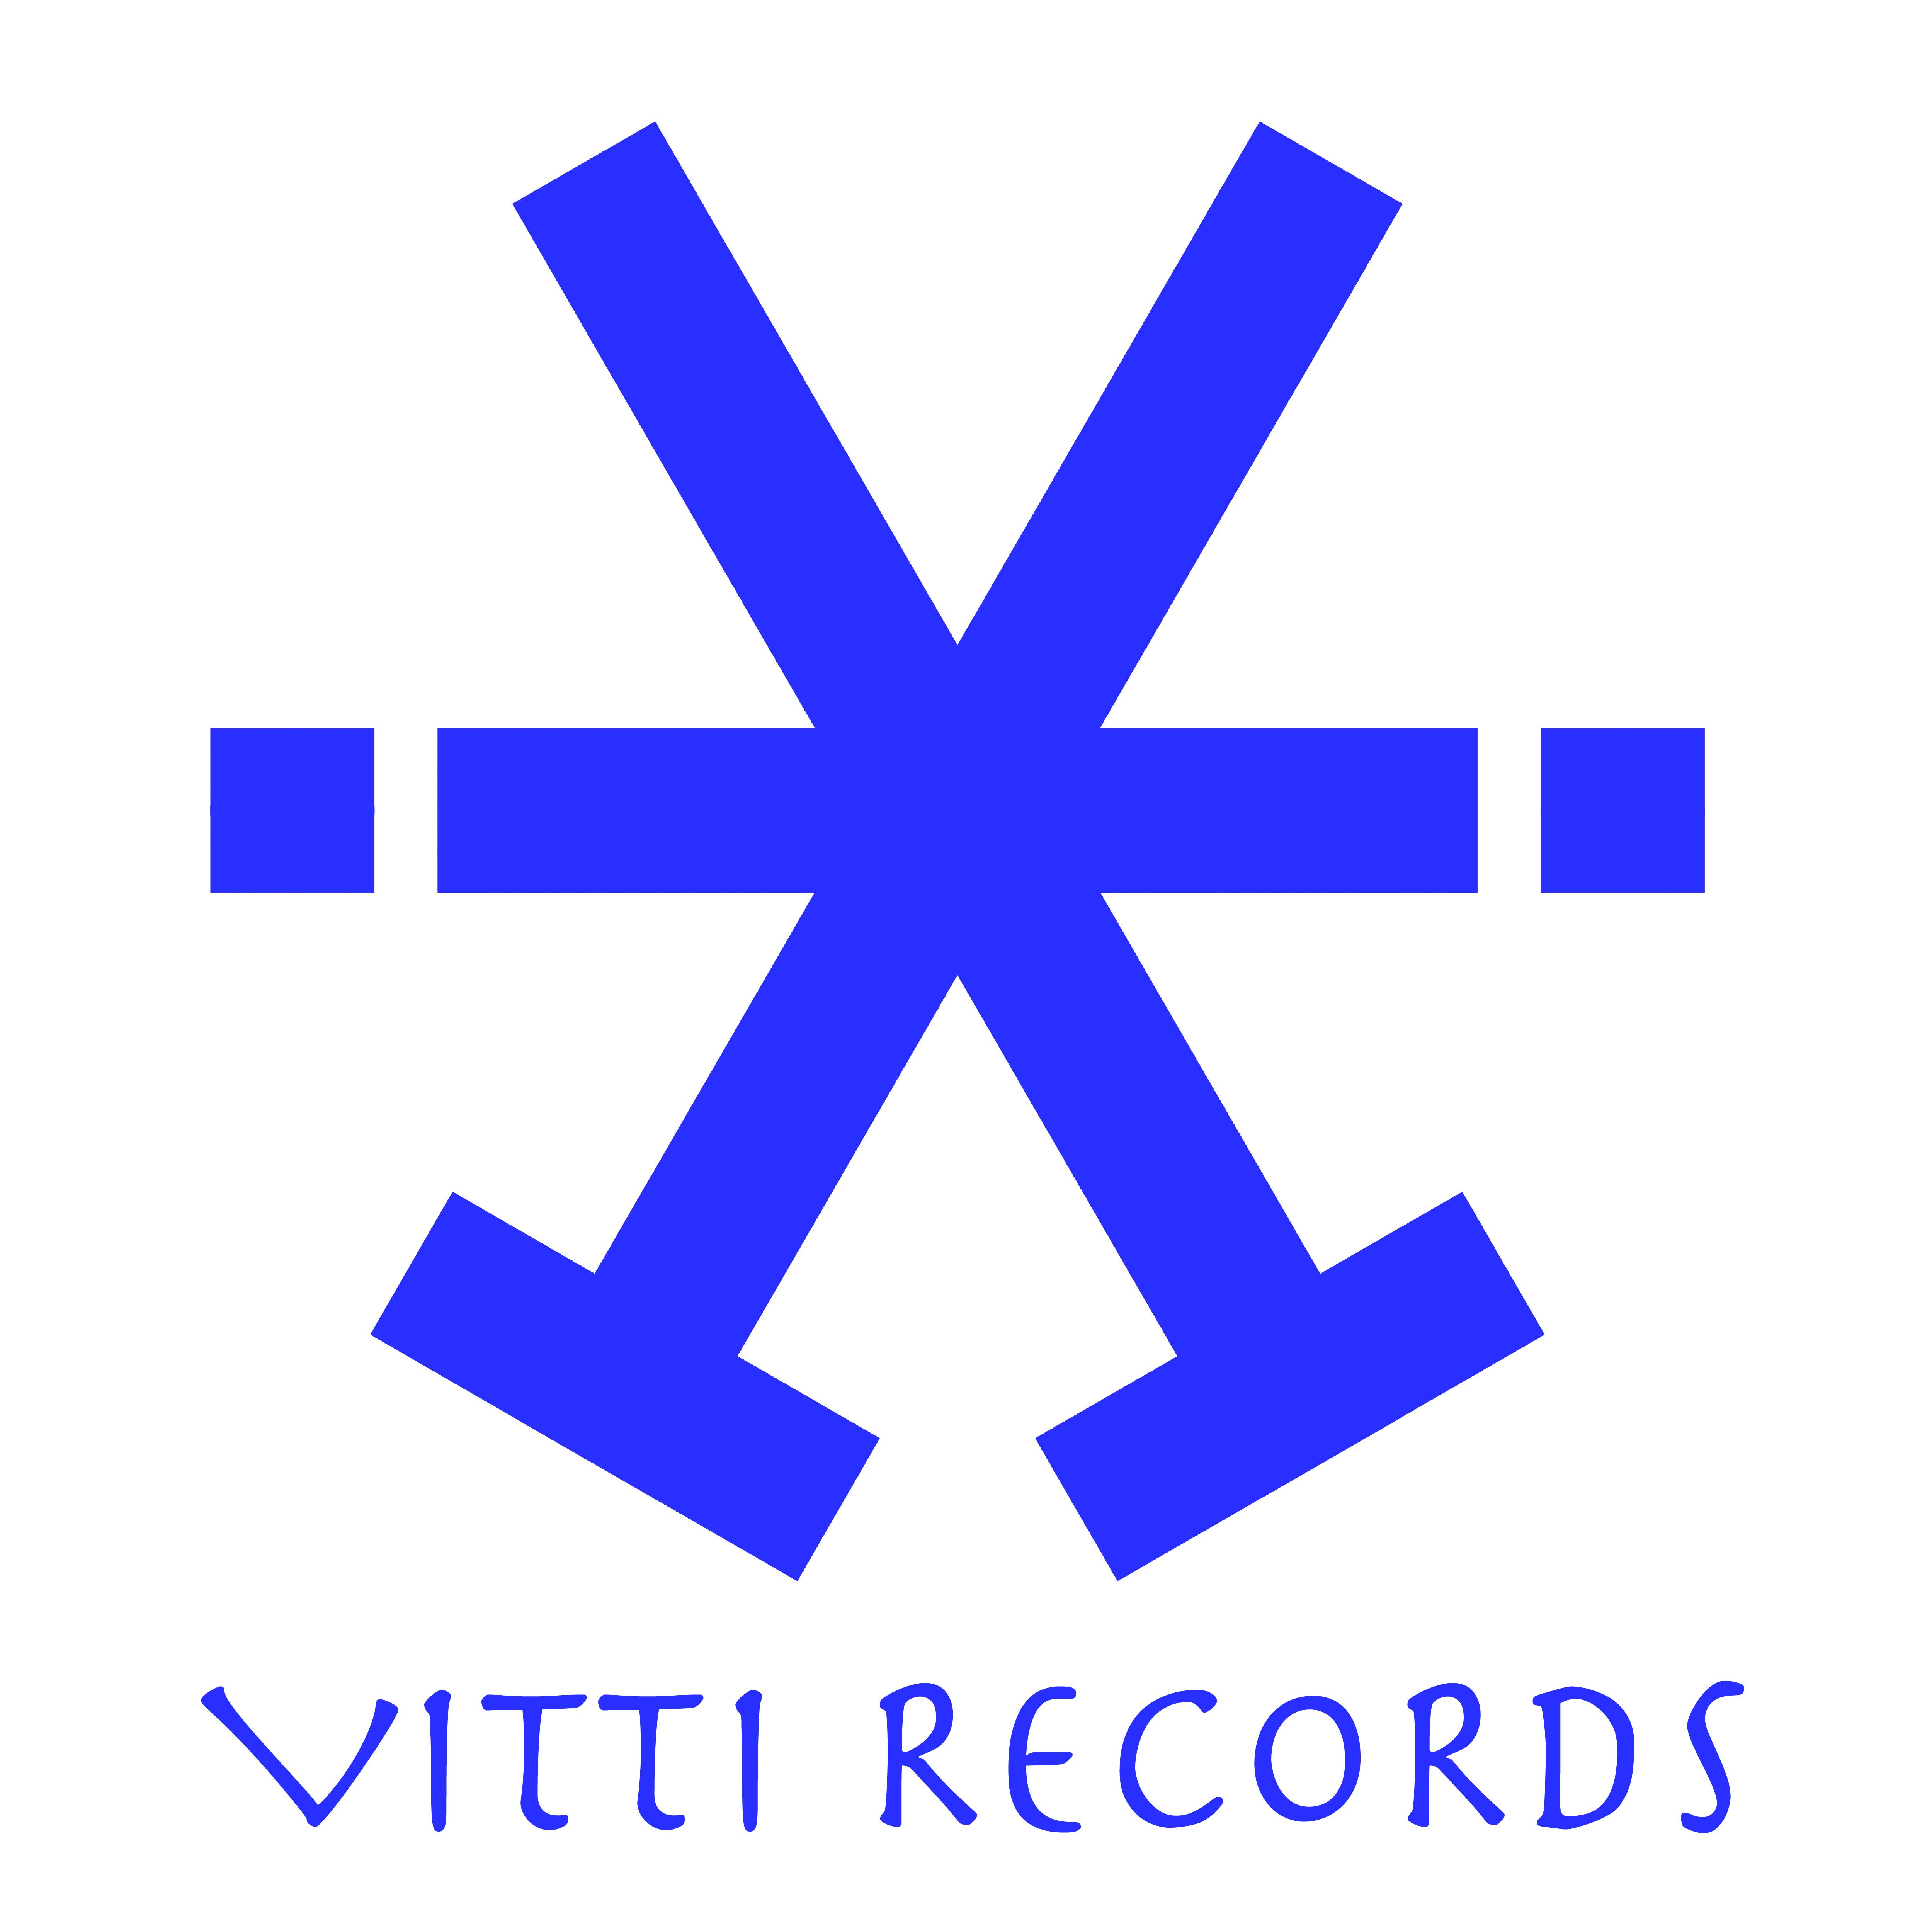 Vitti Records